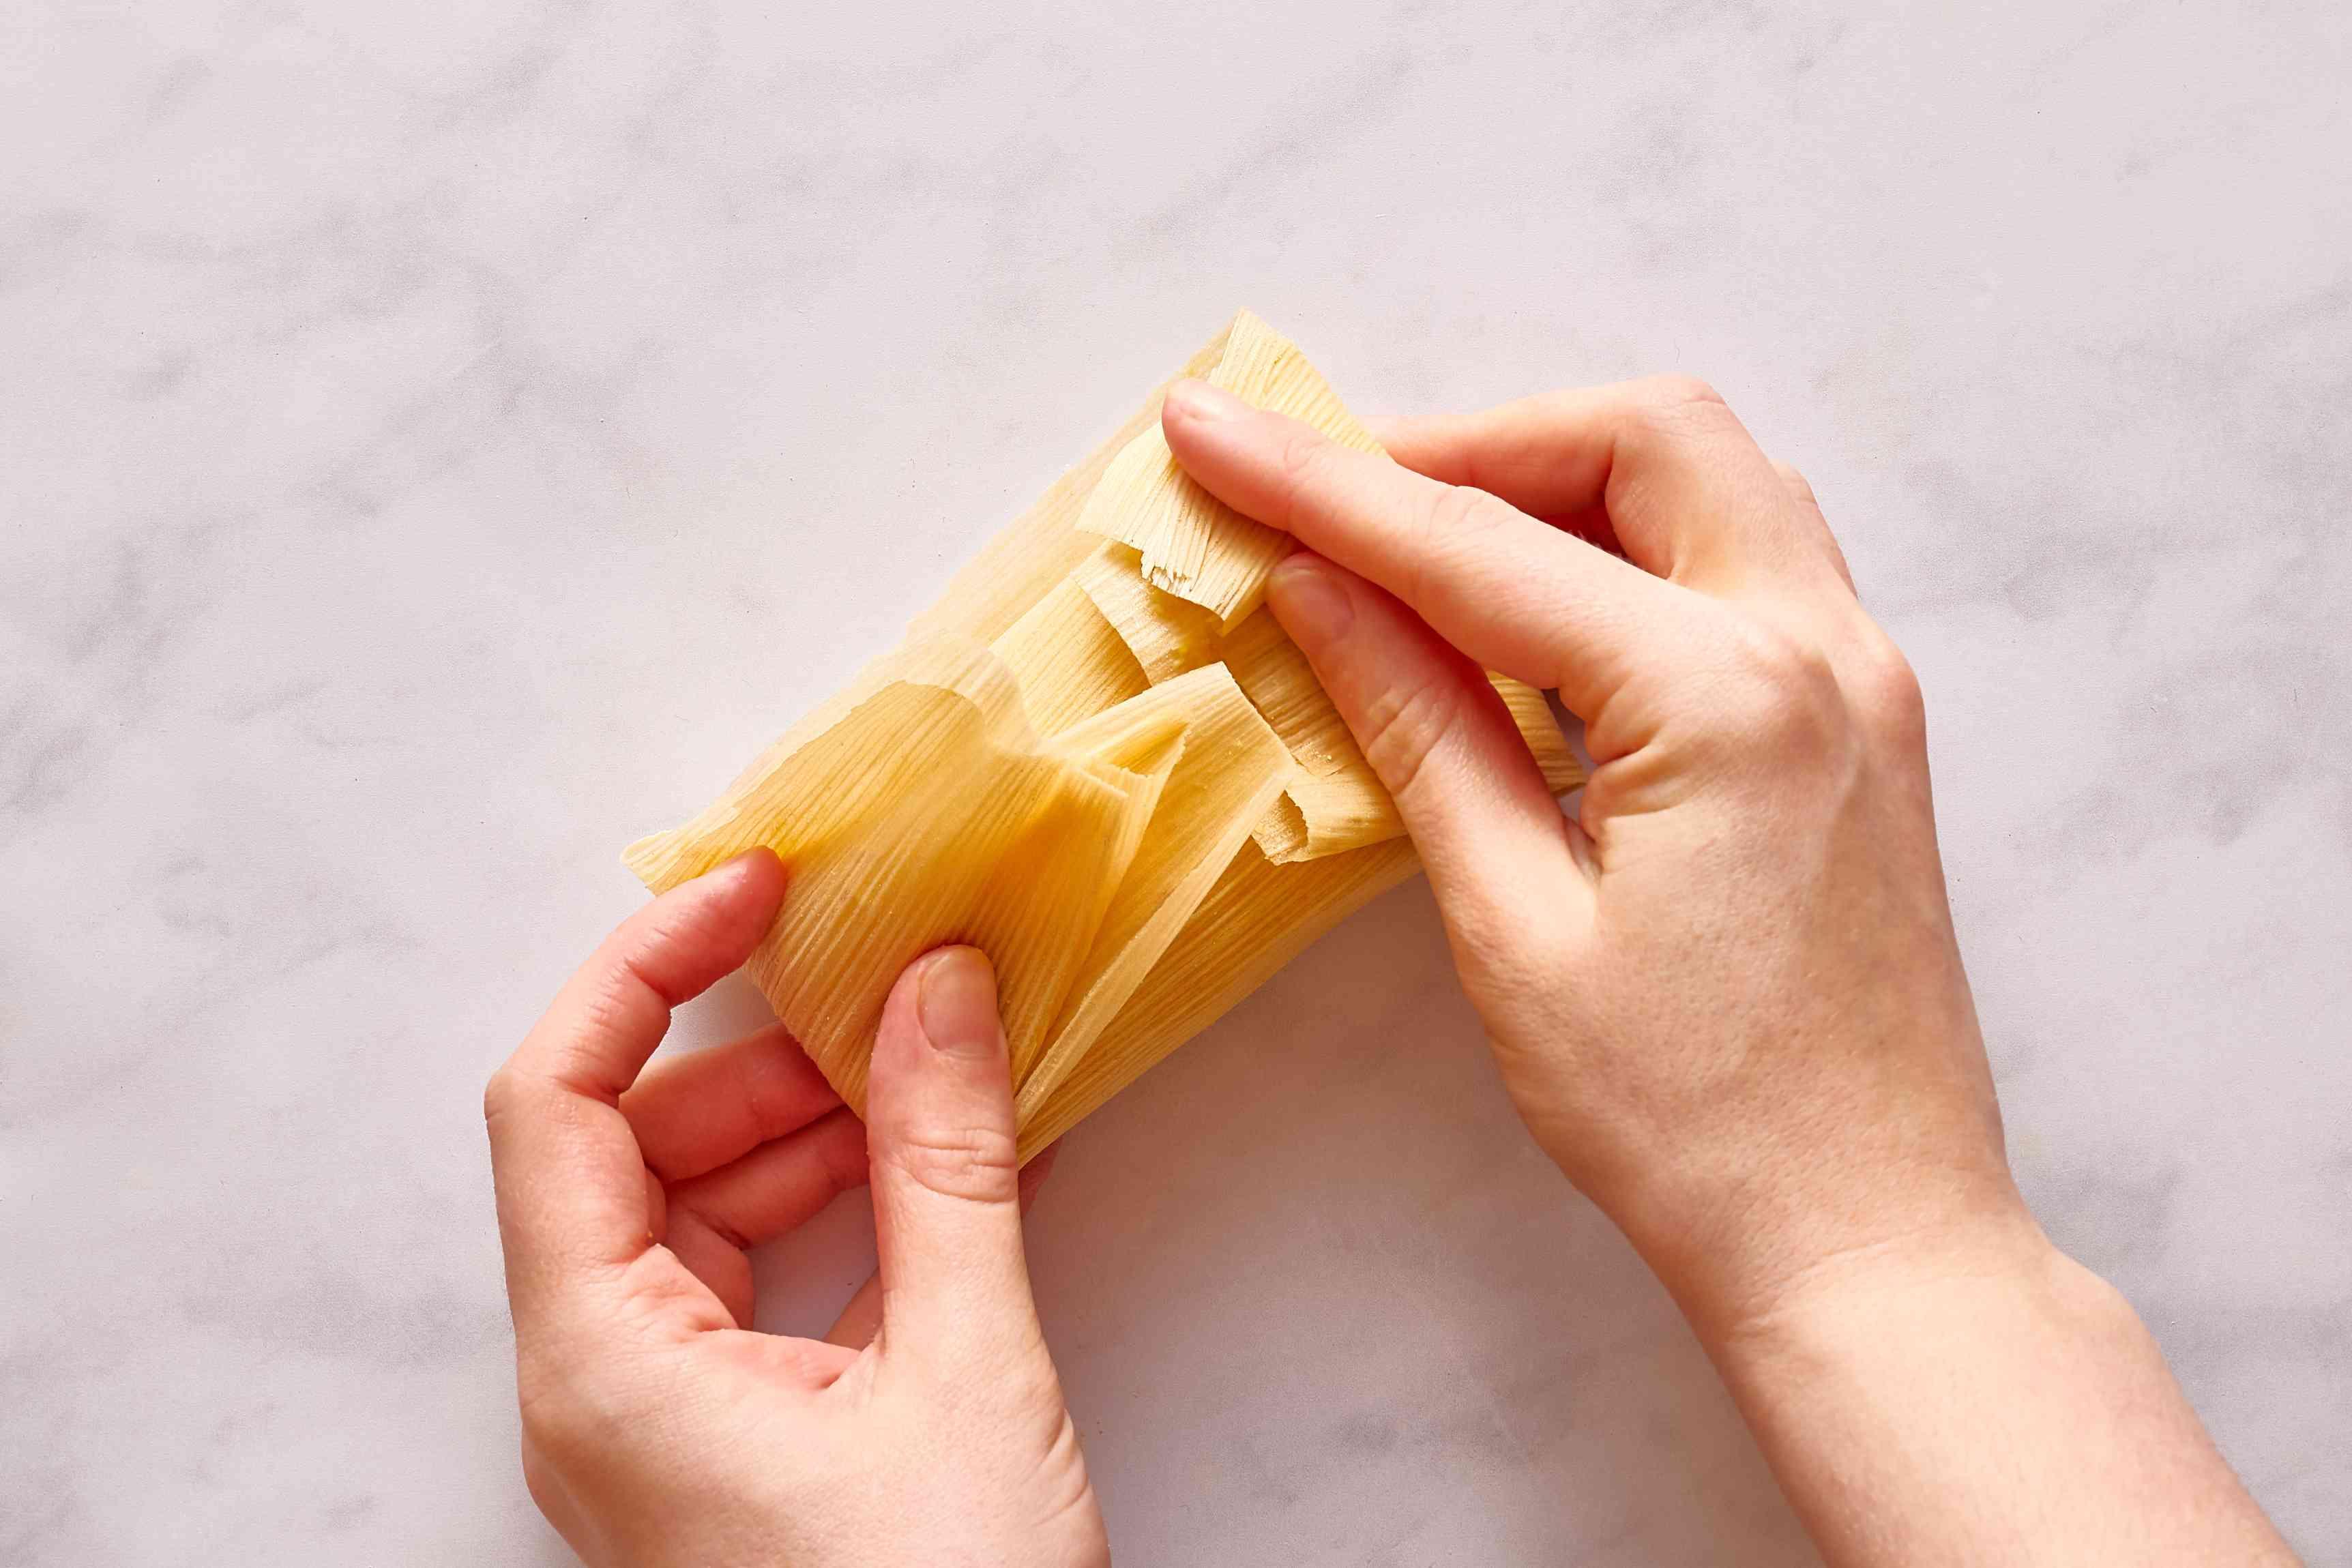 fold the husk around the masa dough